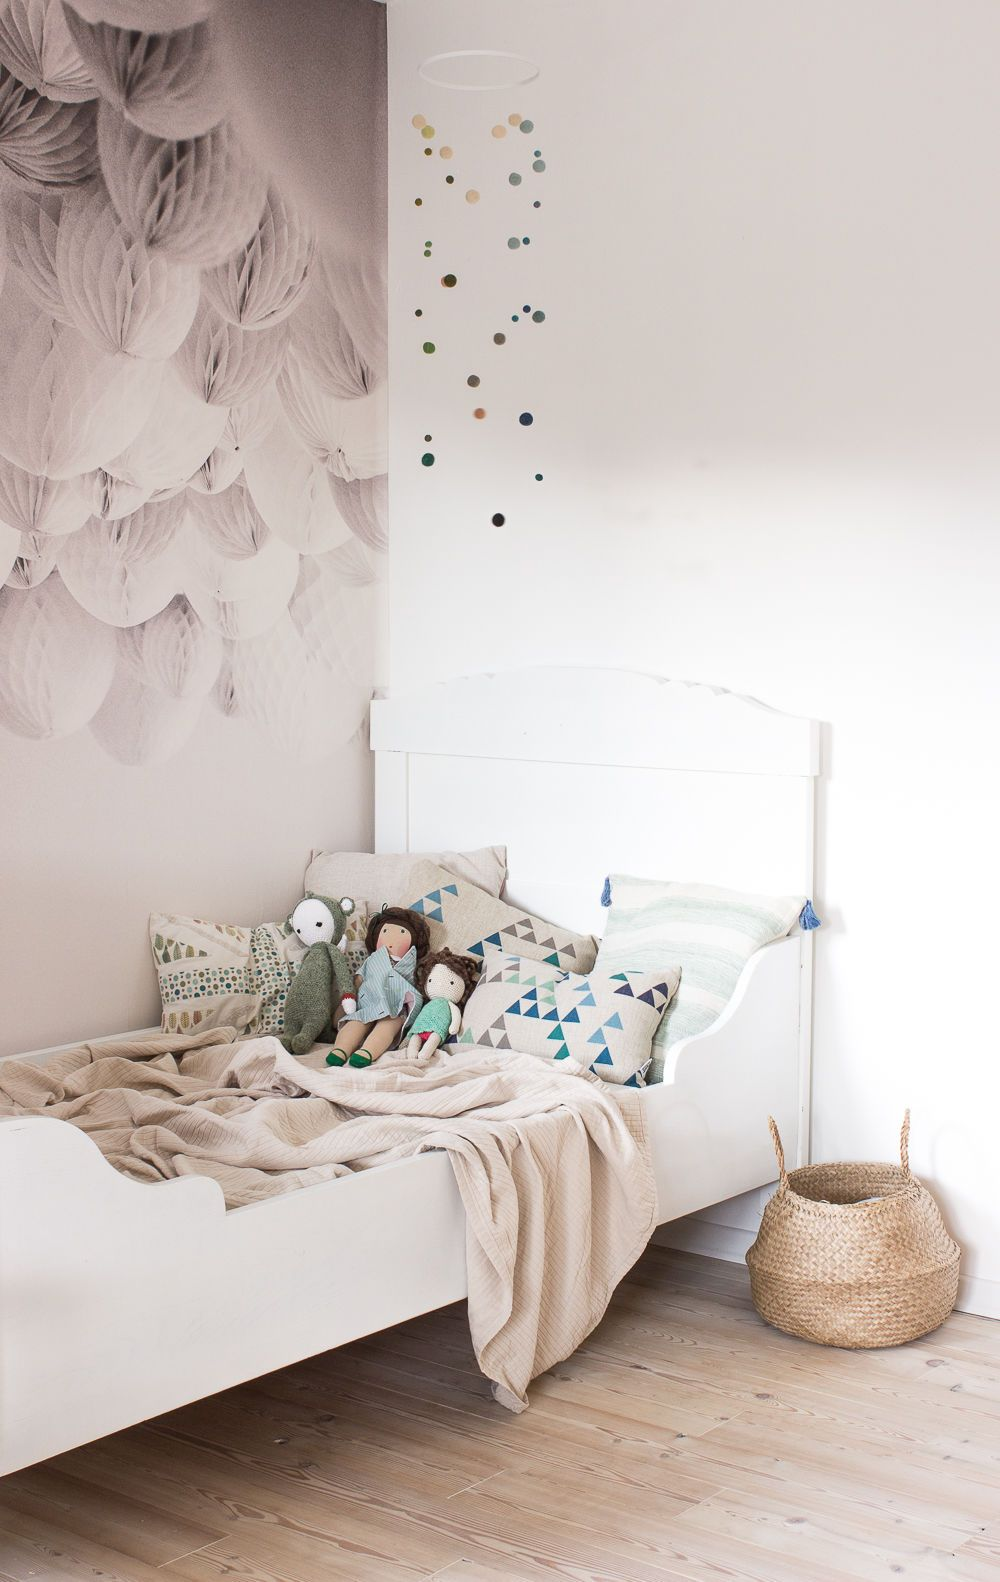 Full Size of Kinderbett Diy Ideen Und Inspirationen Fr Kinderbetten Wohnzimmer Kinderbett Diy